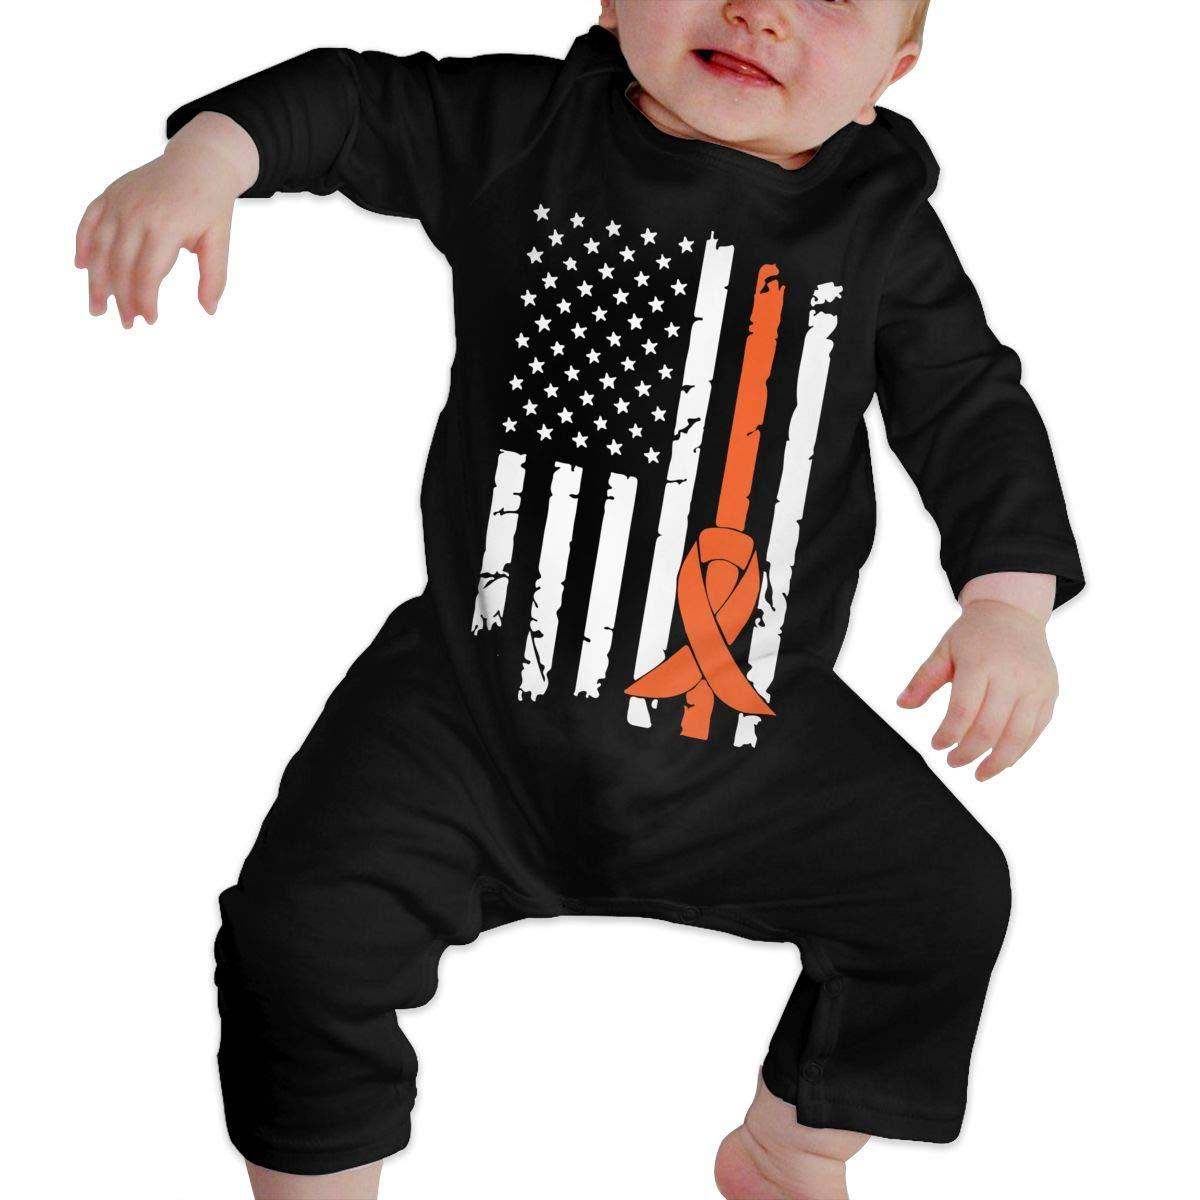 LBJQ8 Kidney Cancer Awareness USA Flag Baby Boy Girl Essential Basic Bodysuits Coverall Jumpsuit